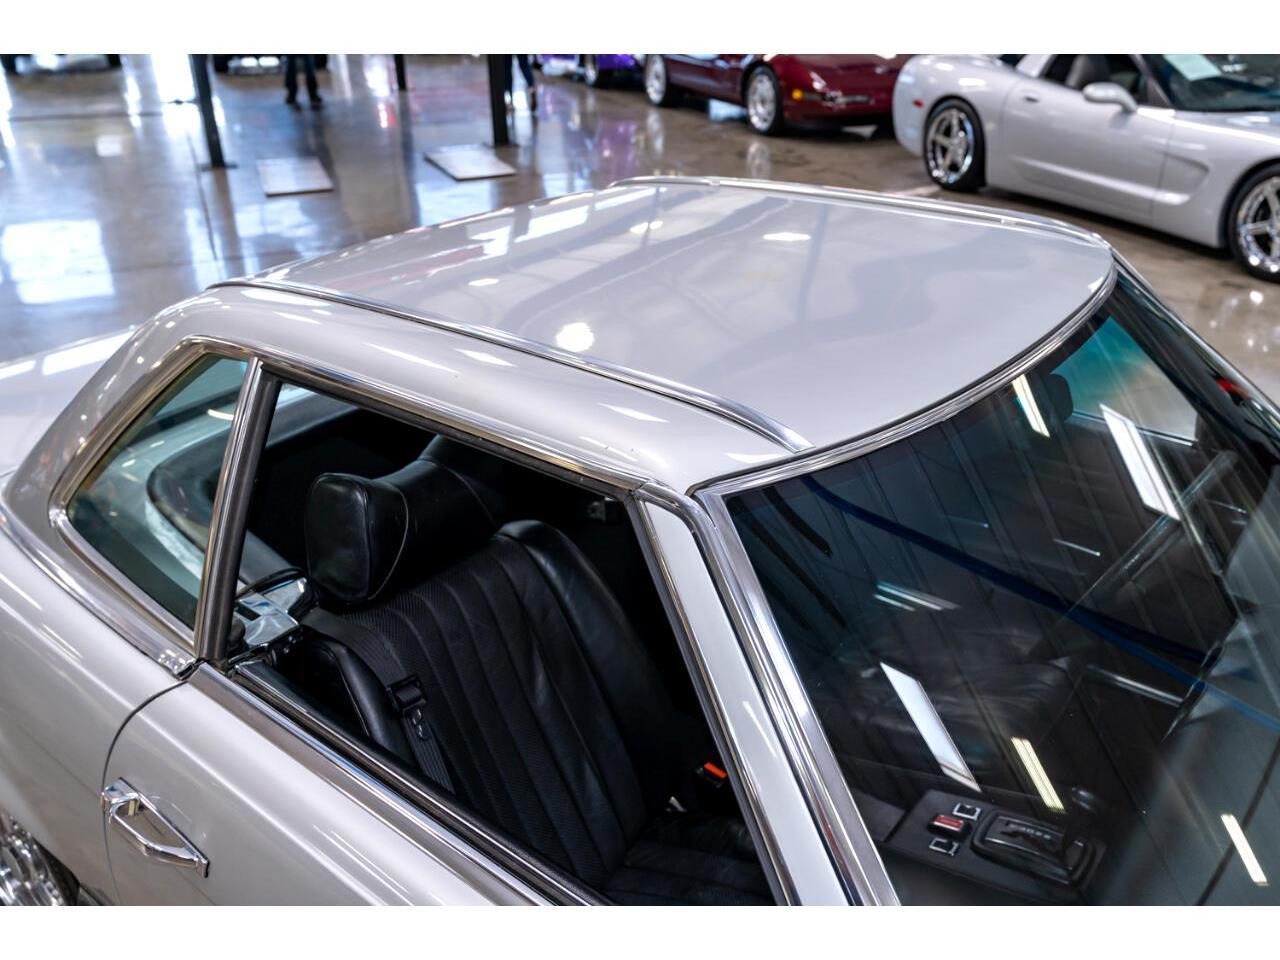 1975 Mercedes-Benz 450SL (CC-1392462) for sale in Salem, Ohio